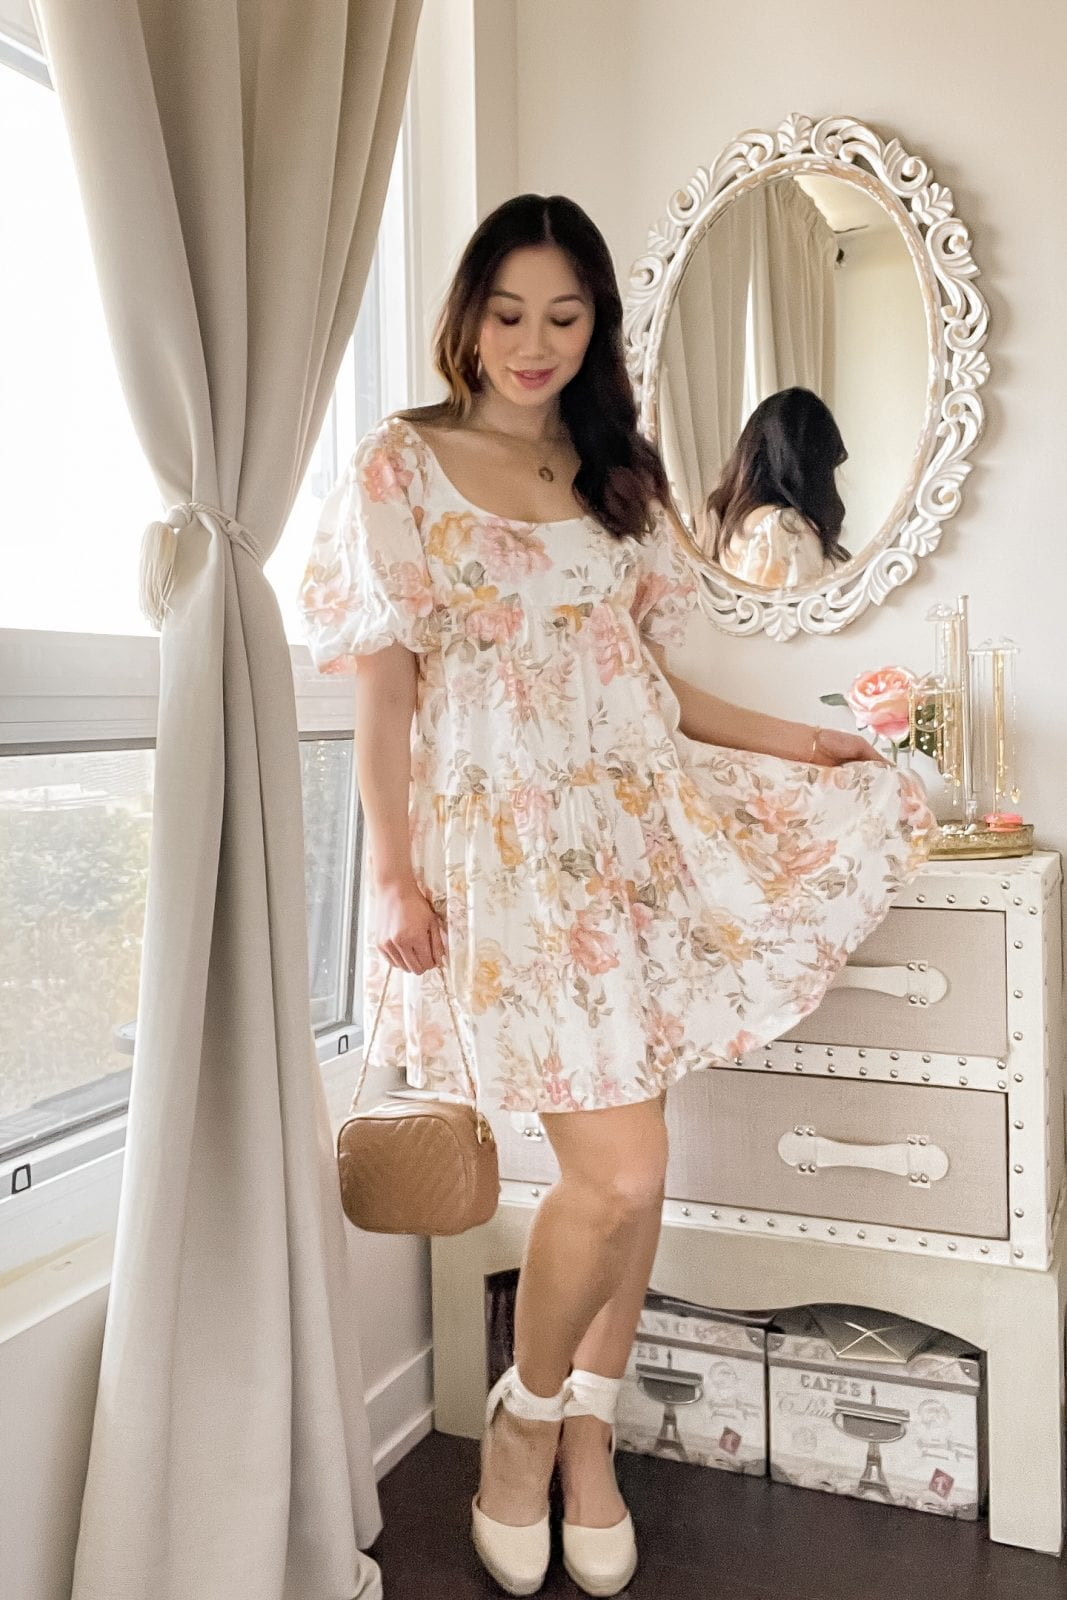 Flowy floral summer dress styled by Eileen Lazazzera of yesmissy.com